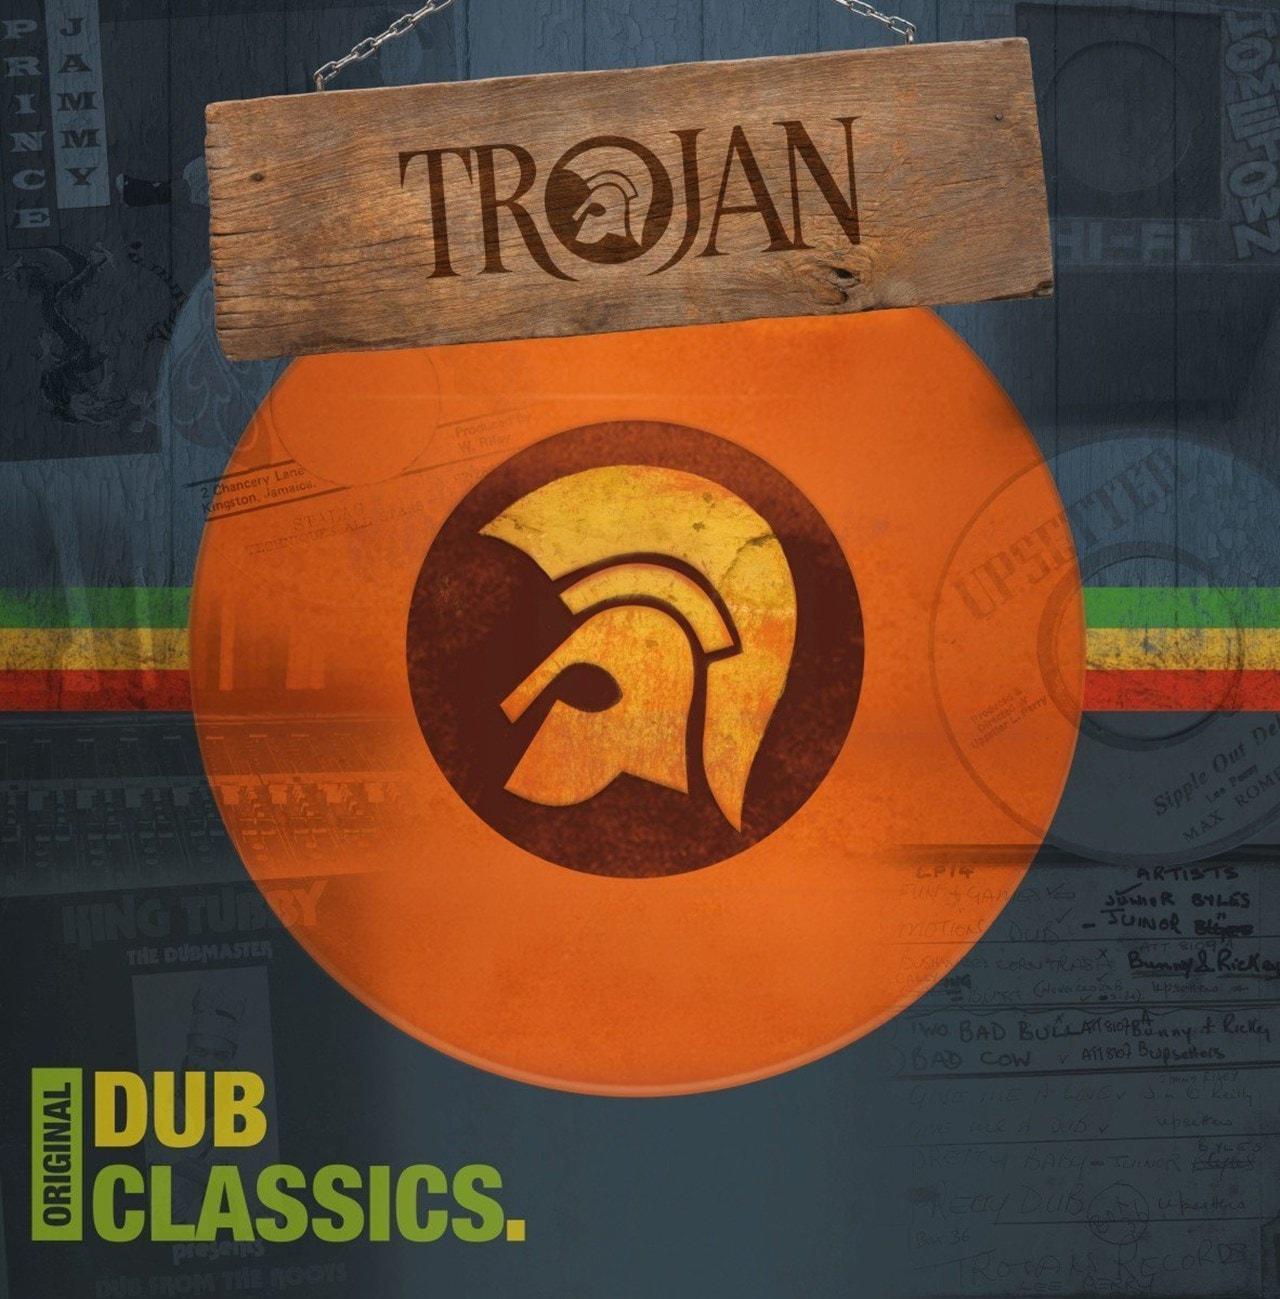 Original Dub Classics - 1